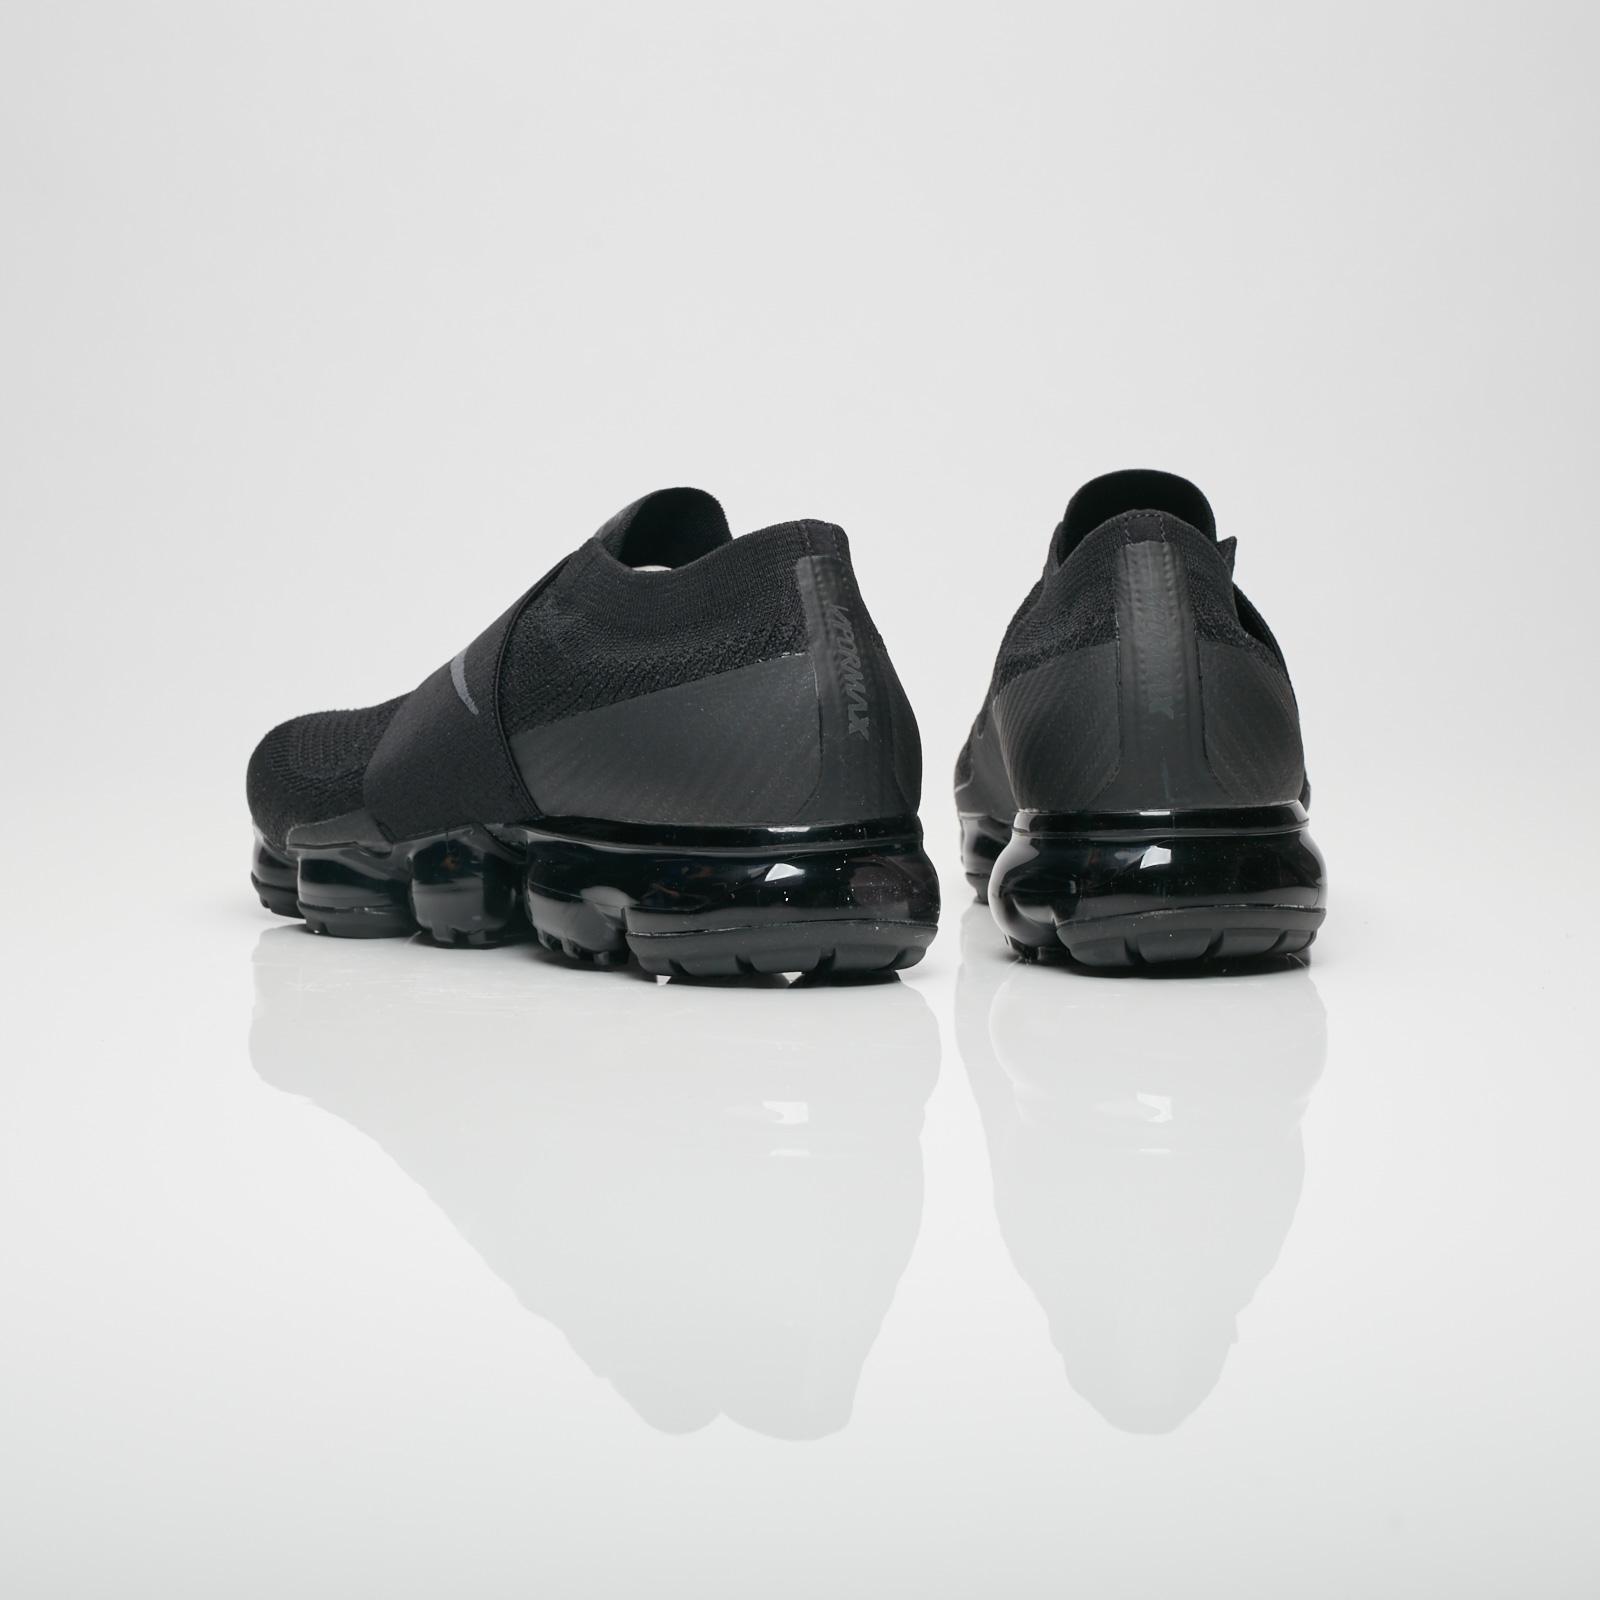 ea19c1f7b2a57 Nike Air Vapormax Flyknit MOC - Ah3397-004 - Sneakersnstuff ...